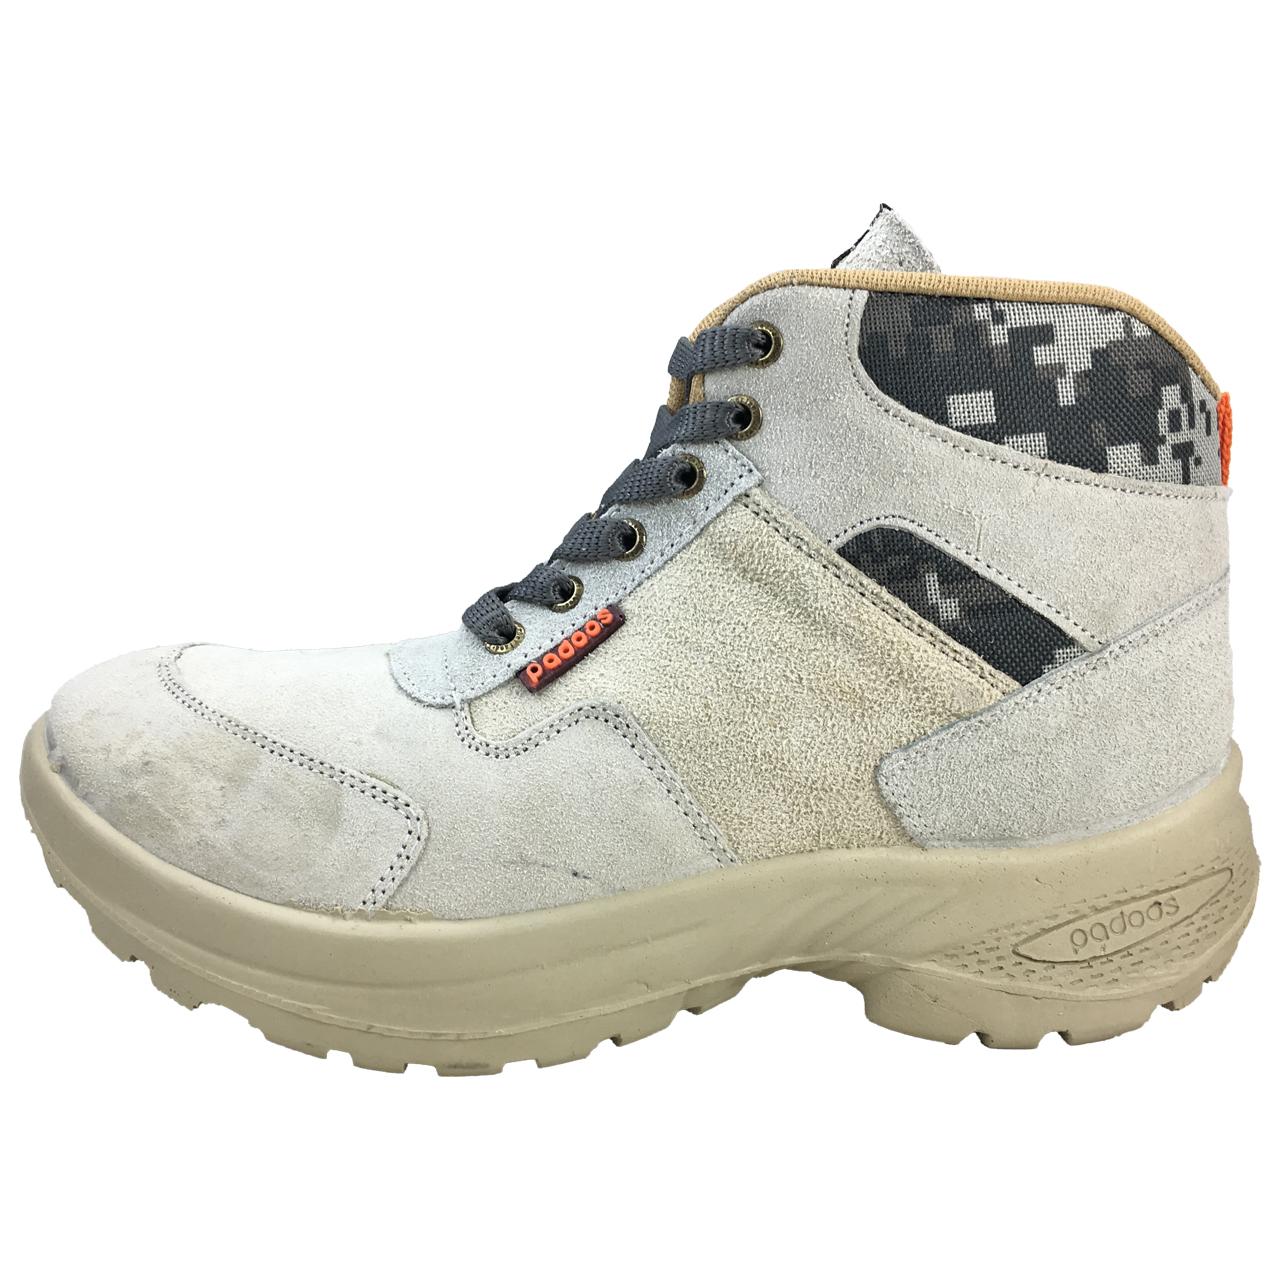 قیمت کفش مردانه کوهنوردی اسلوبی مدل کوهستان کد 2543